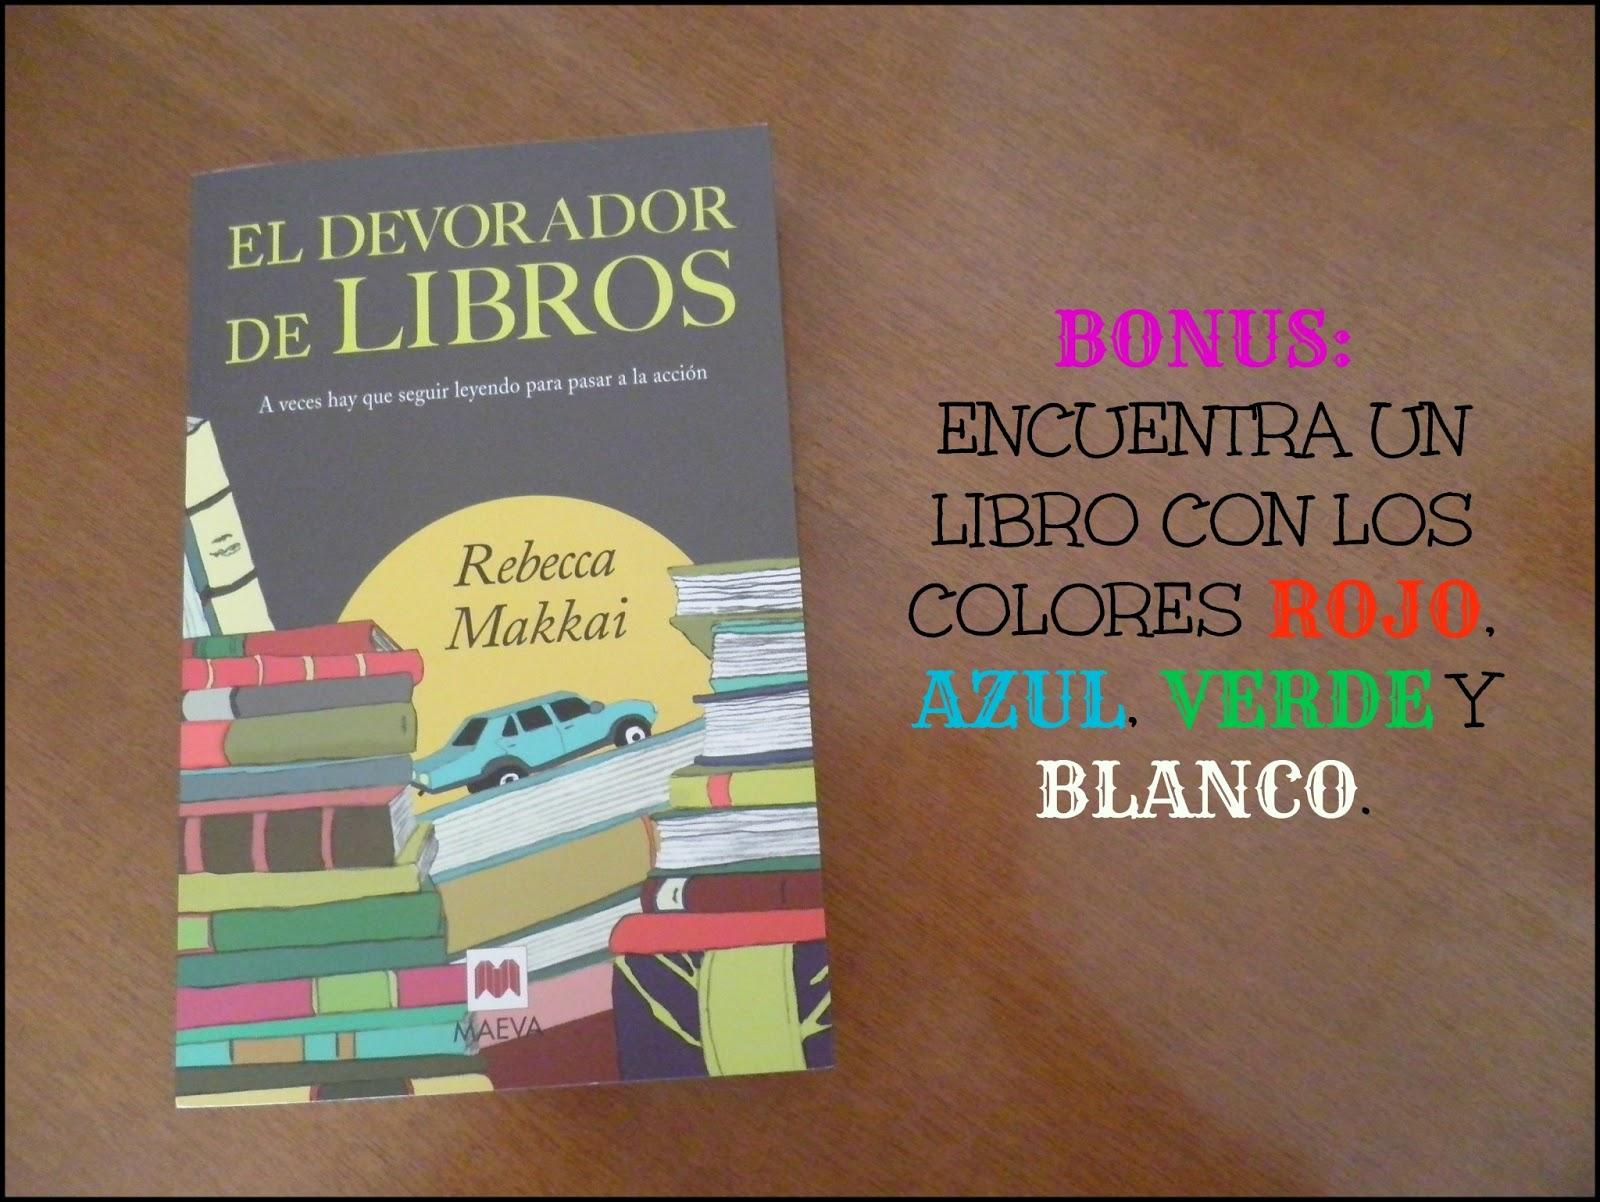 Book Cover Portadas Elementales : A petrie le gustan los libros book tag quot portadas elementales